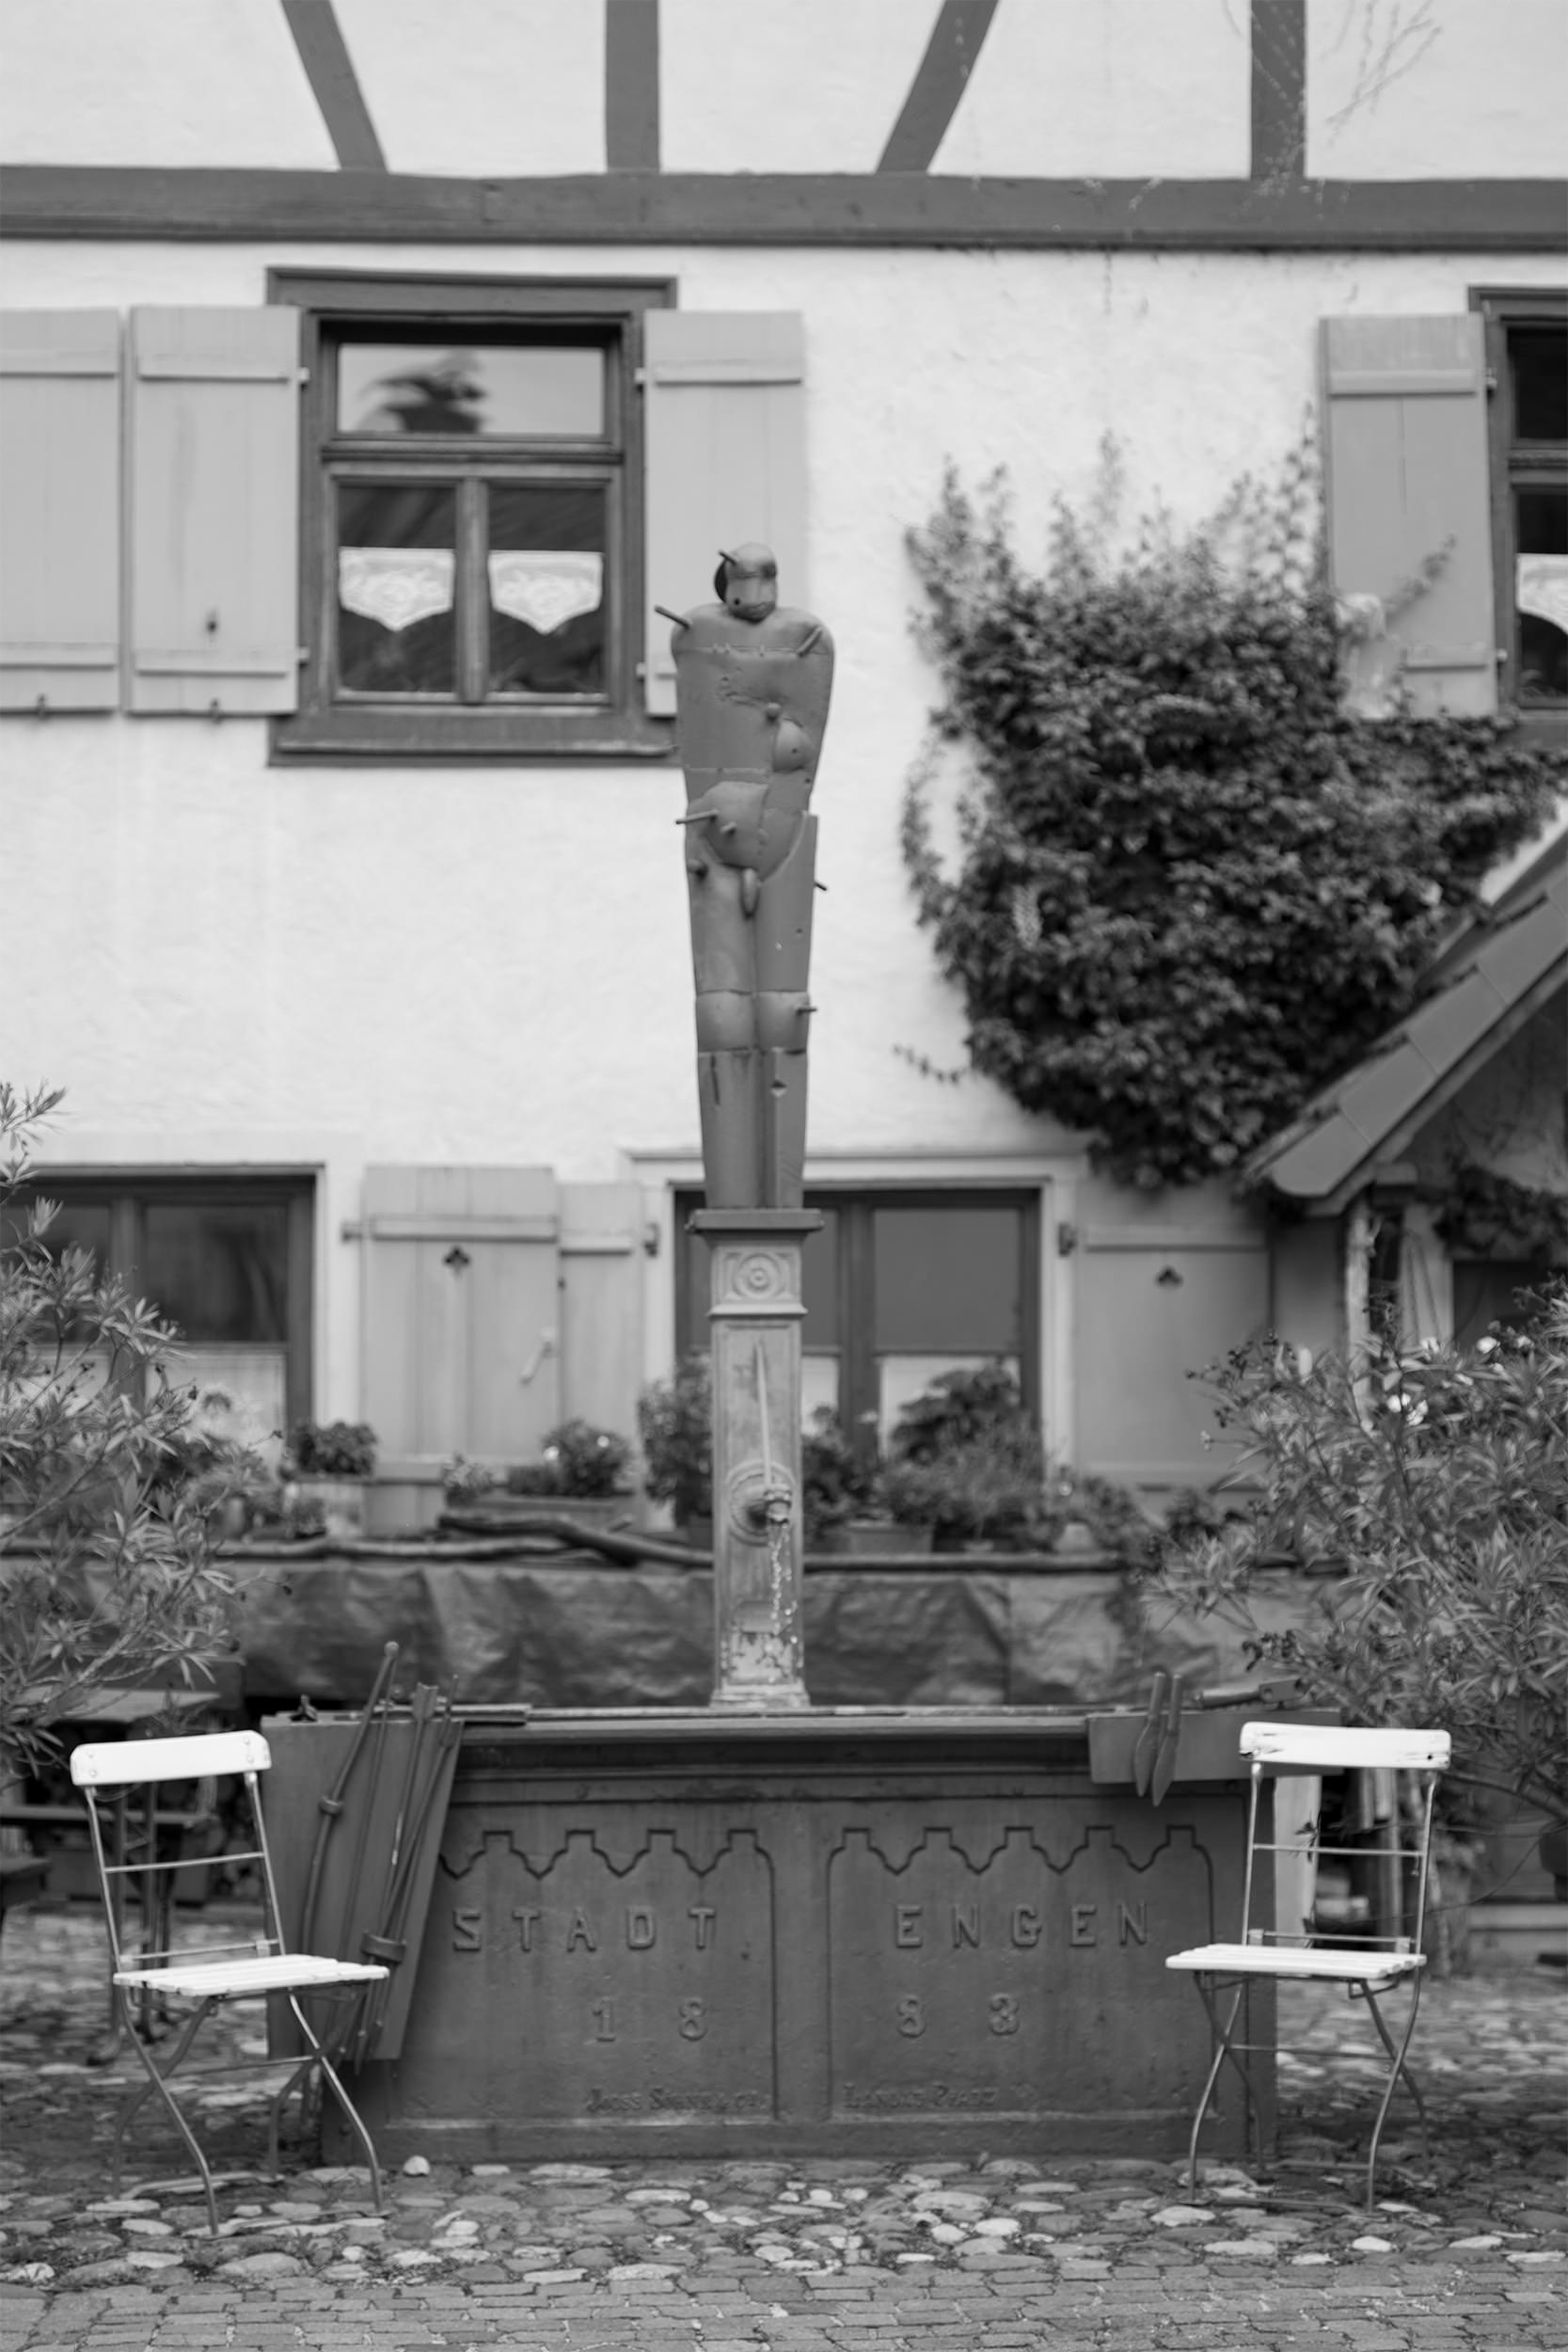 Zentraler Brunnen in der Altstadt von Engen.